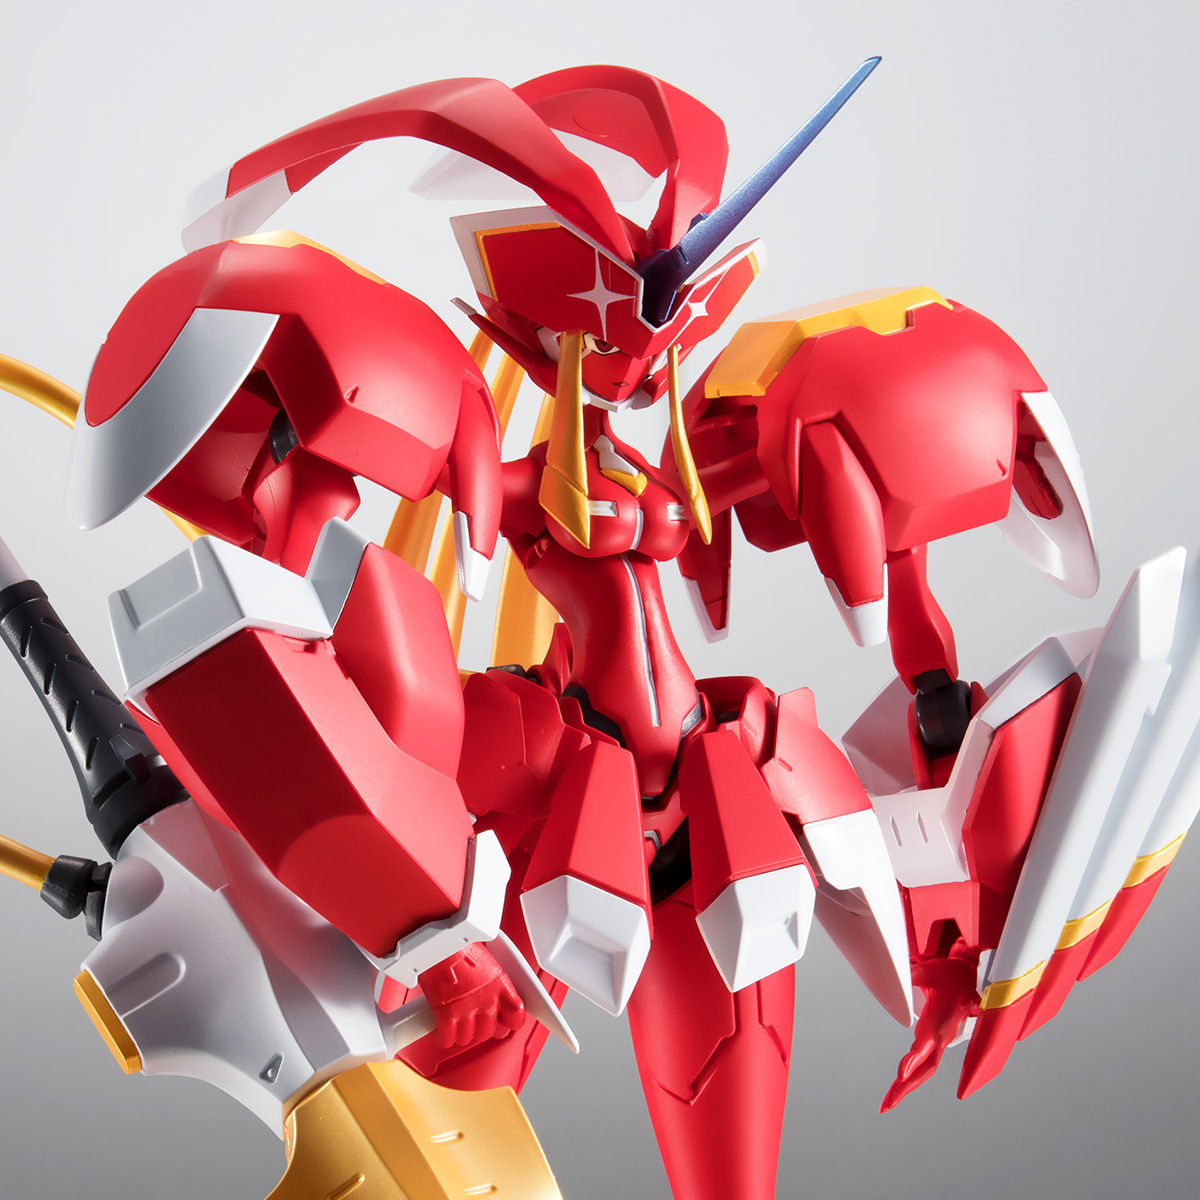 ROBOT魂〈SIDE FRANXX〉『ストレリチア・XX(キス)』ダーリン・イン・ザ・フランキス 可動フィギュア-001